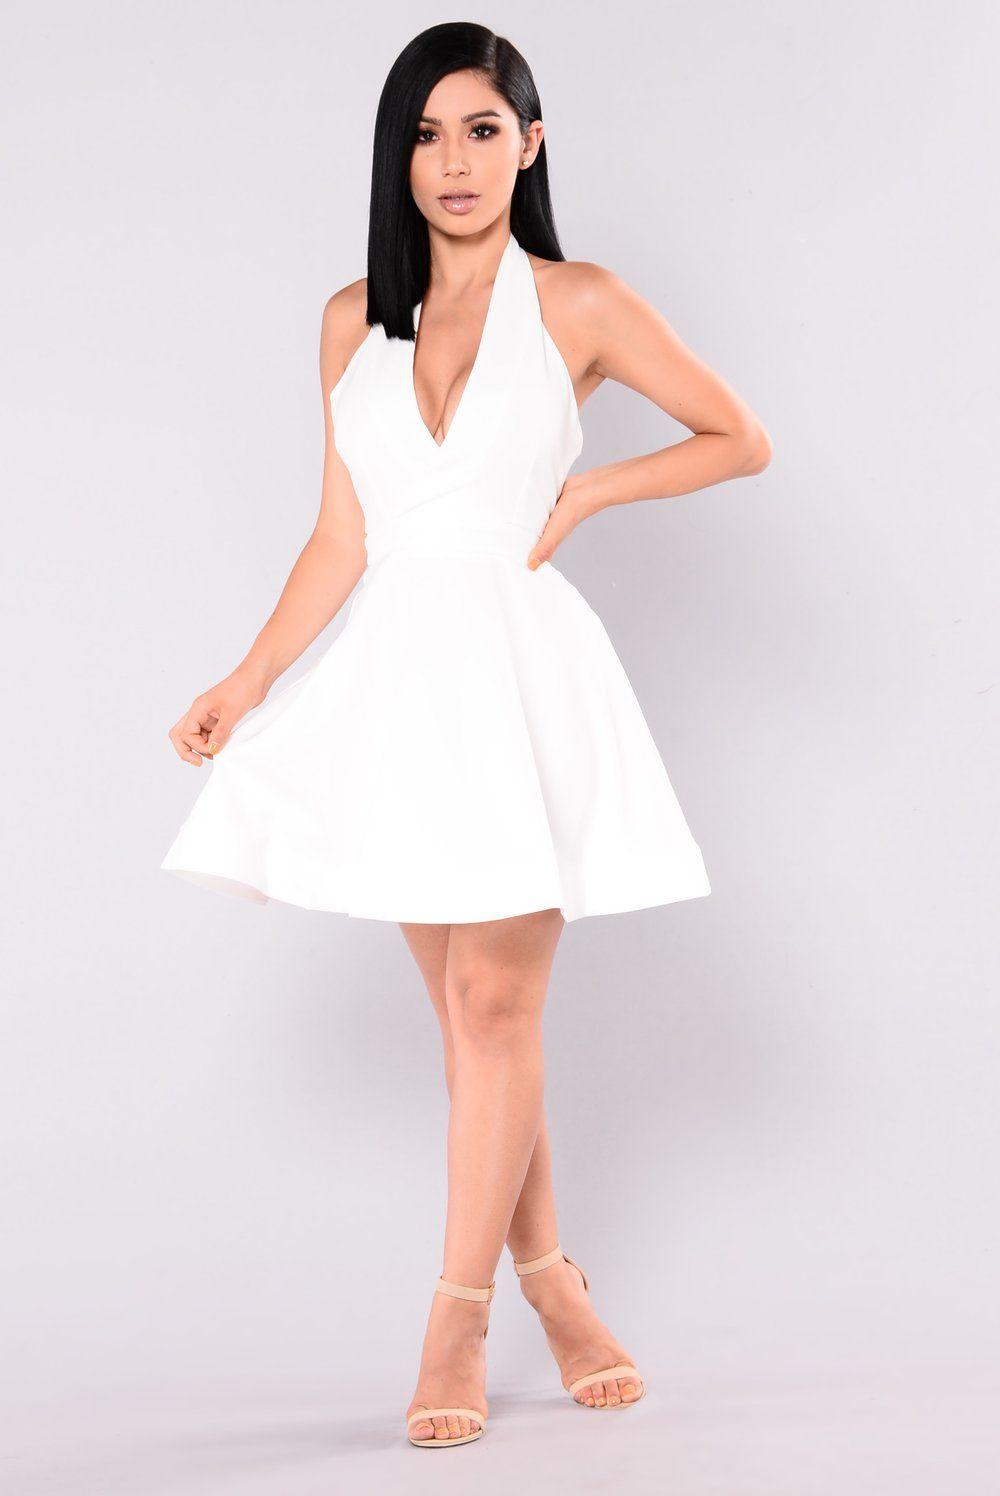 Paula Skater Dress - White  7c5ece1ff